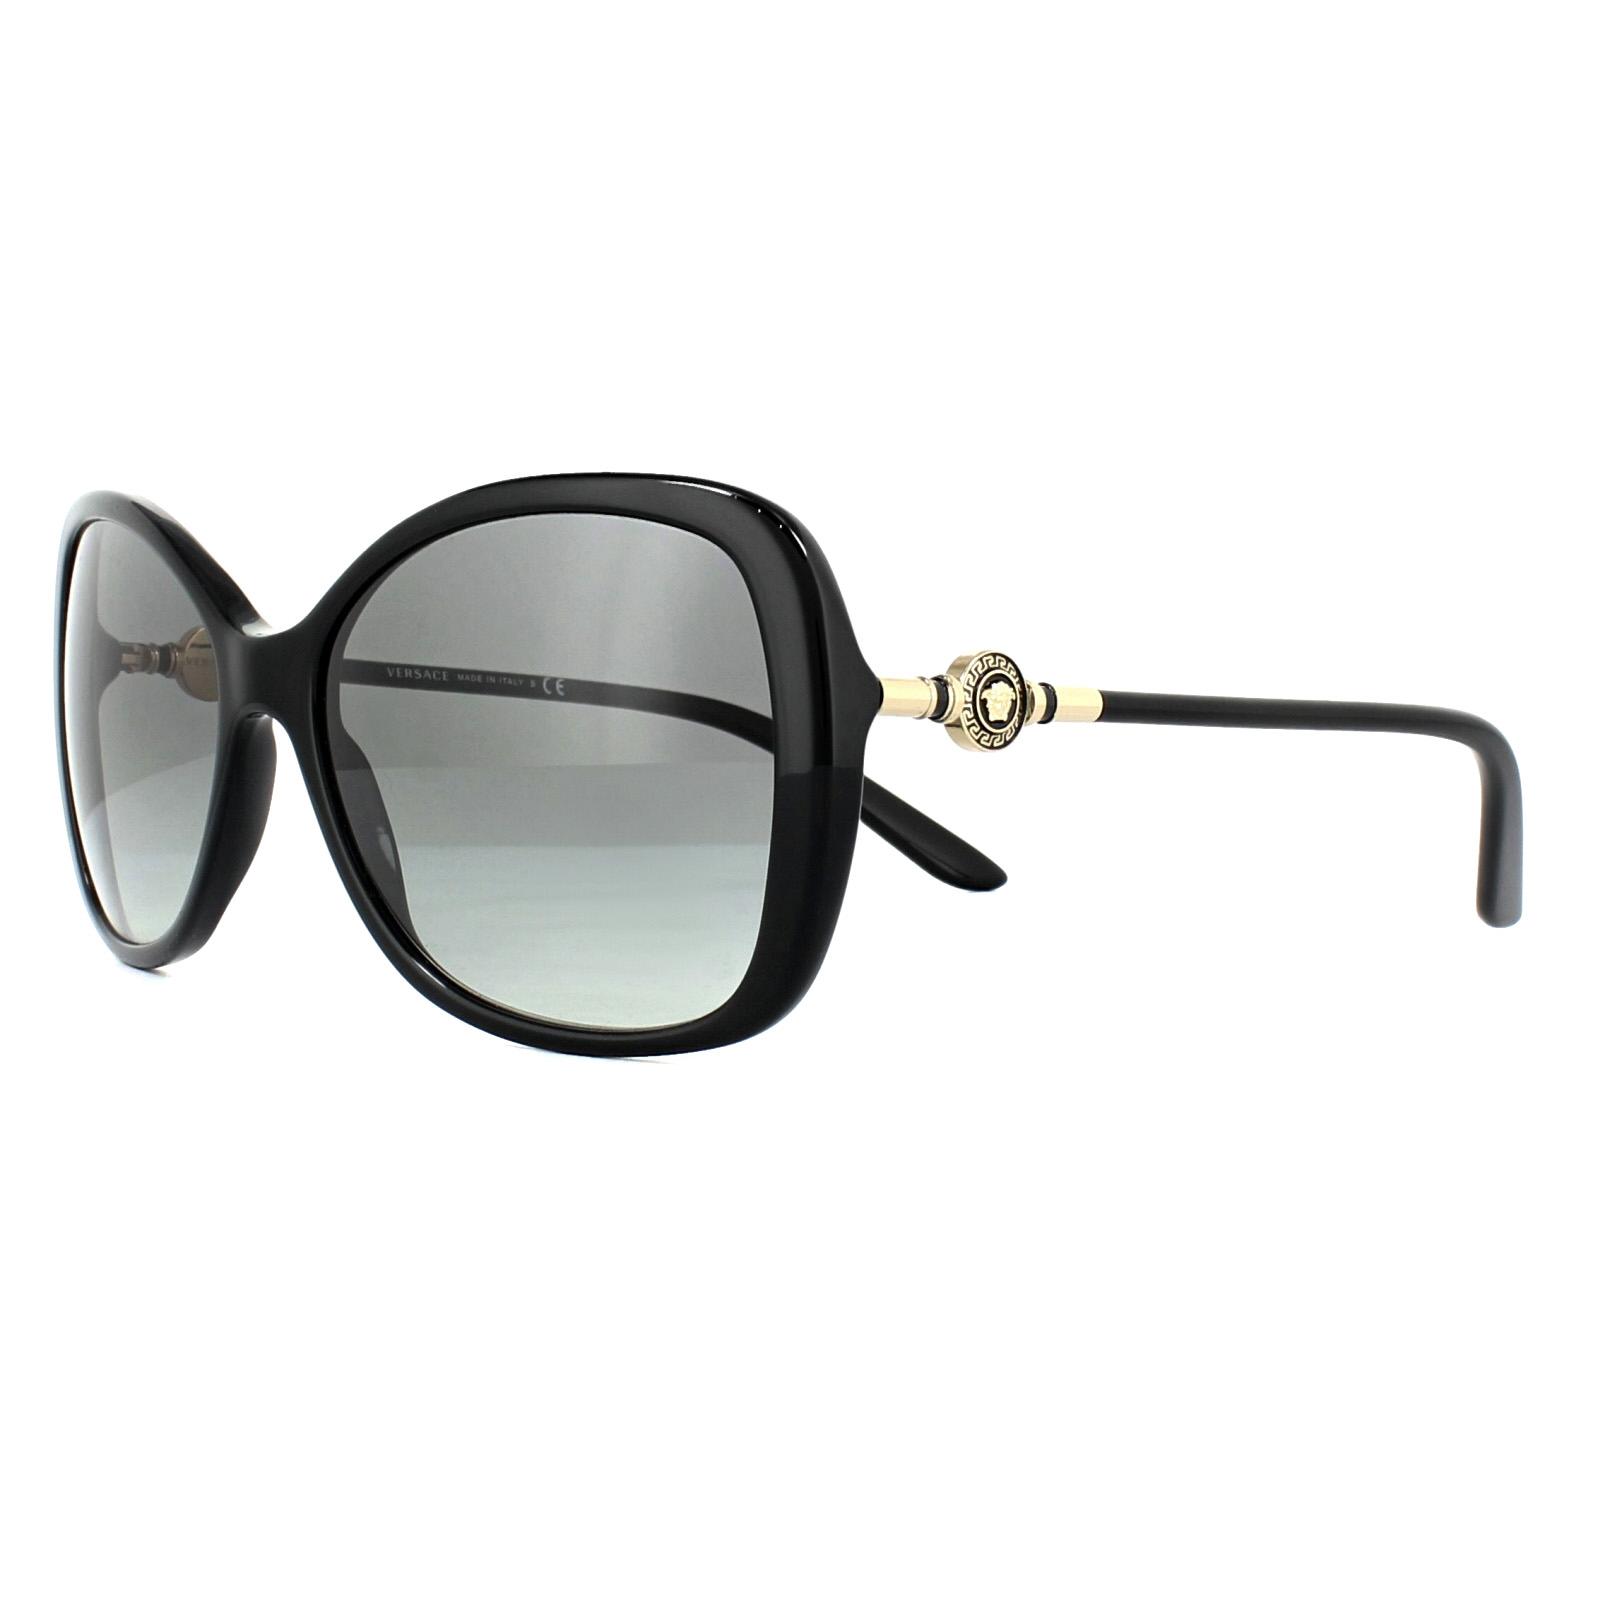 6edc192f28f11 Sentinel Versace Sunglasses VE4303 GB1 11 Black Grey Gradient